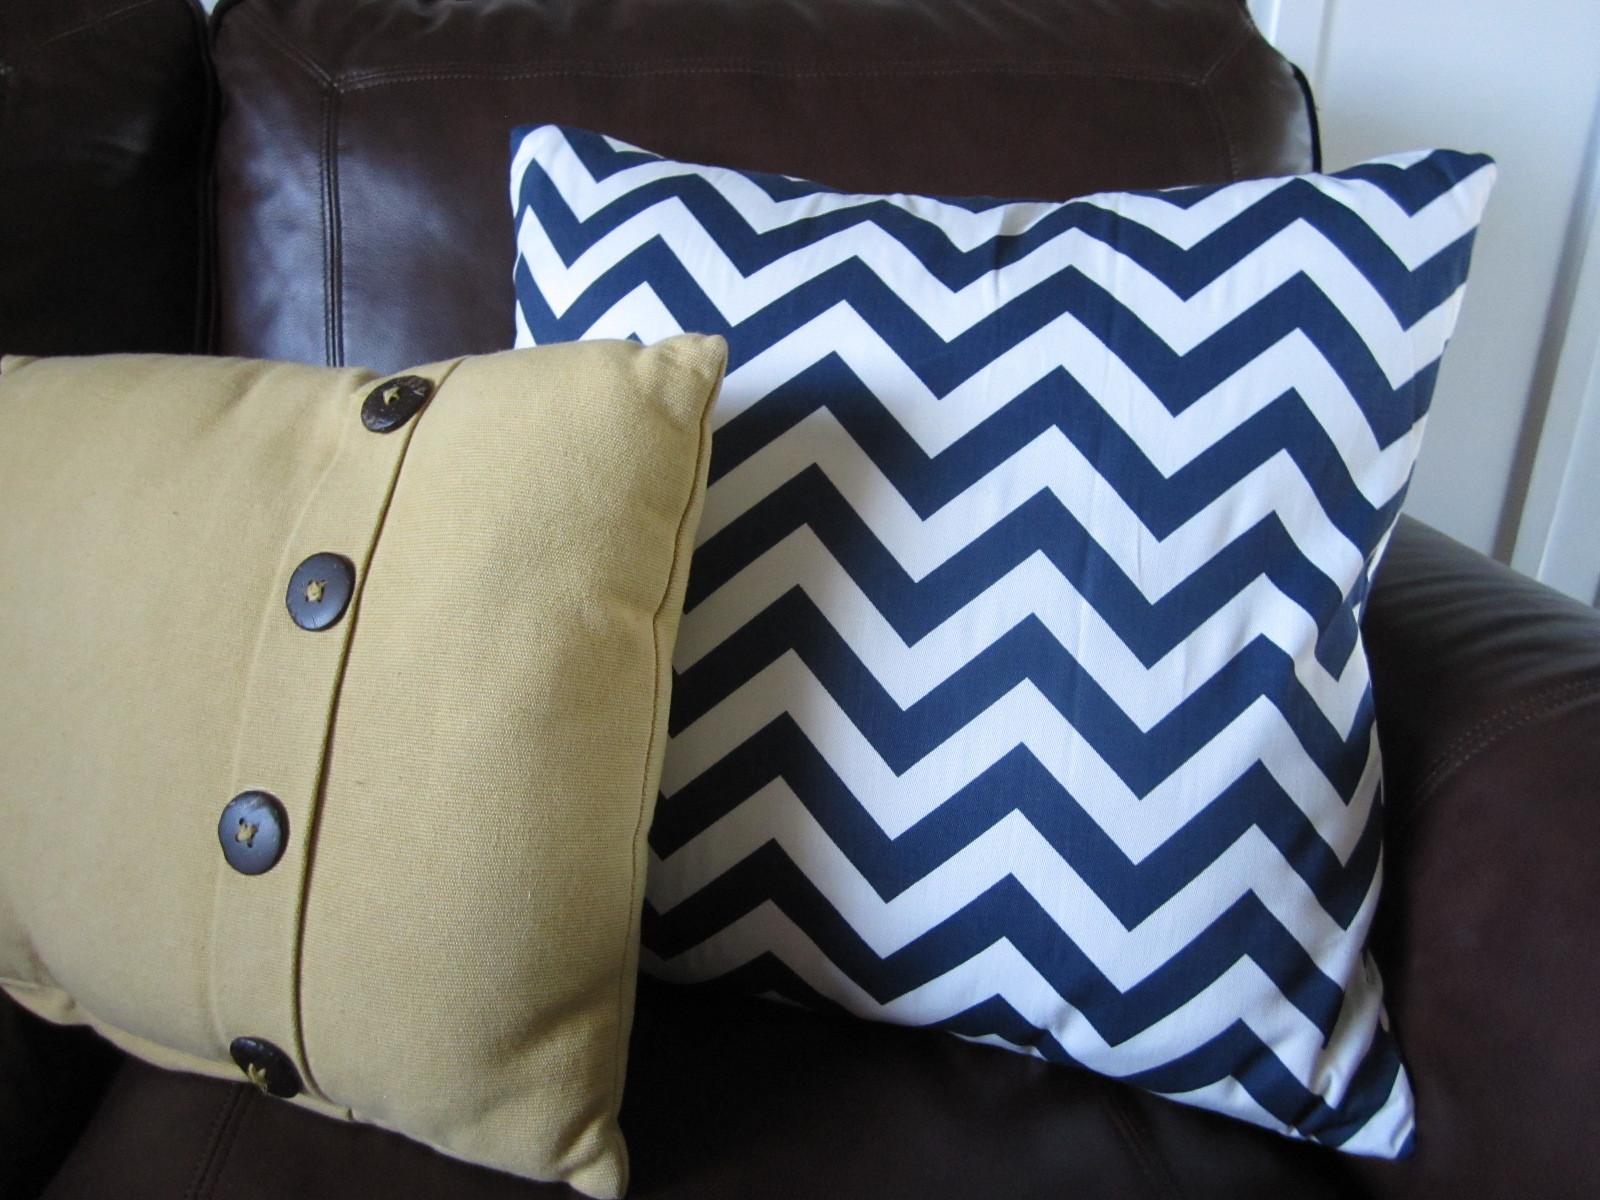 Best ideas about DIY Throw Pillows . Save or Pin KrisKraft Easy DIY Throw Pillows Now.